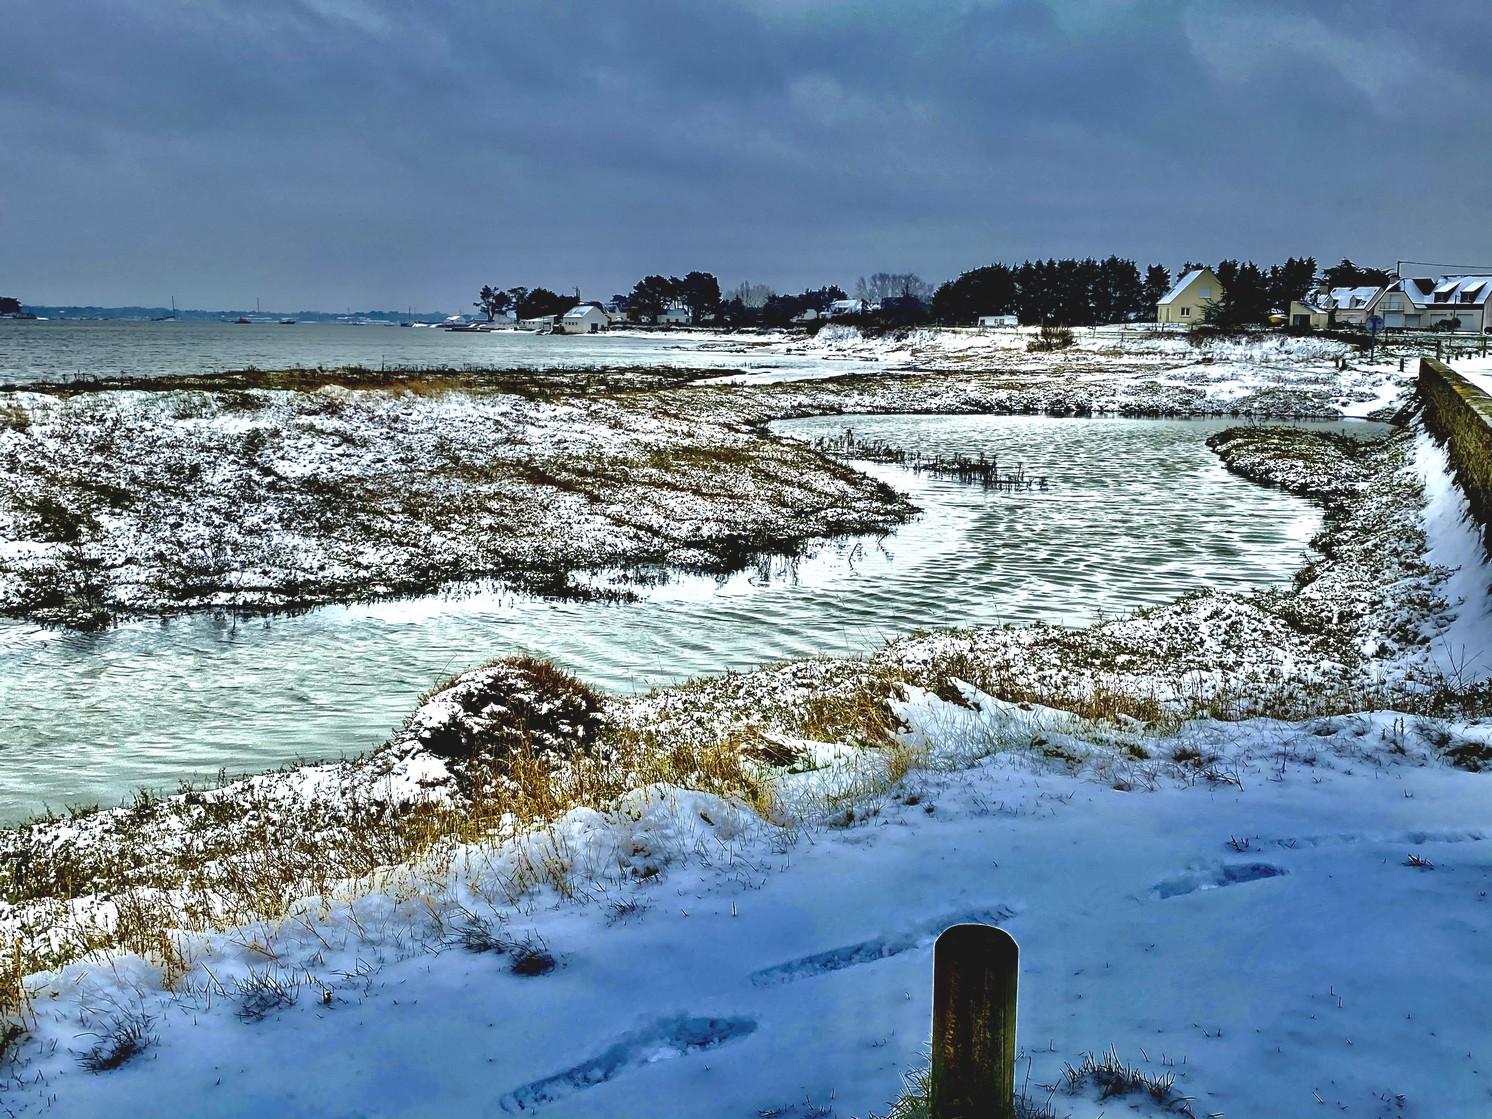 Penerf en Damgan sous la neige - morbihan bretagne©Philippe Jaquemin (10)